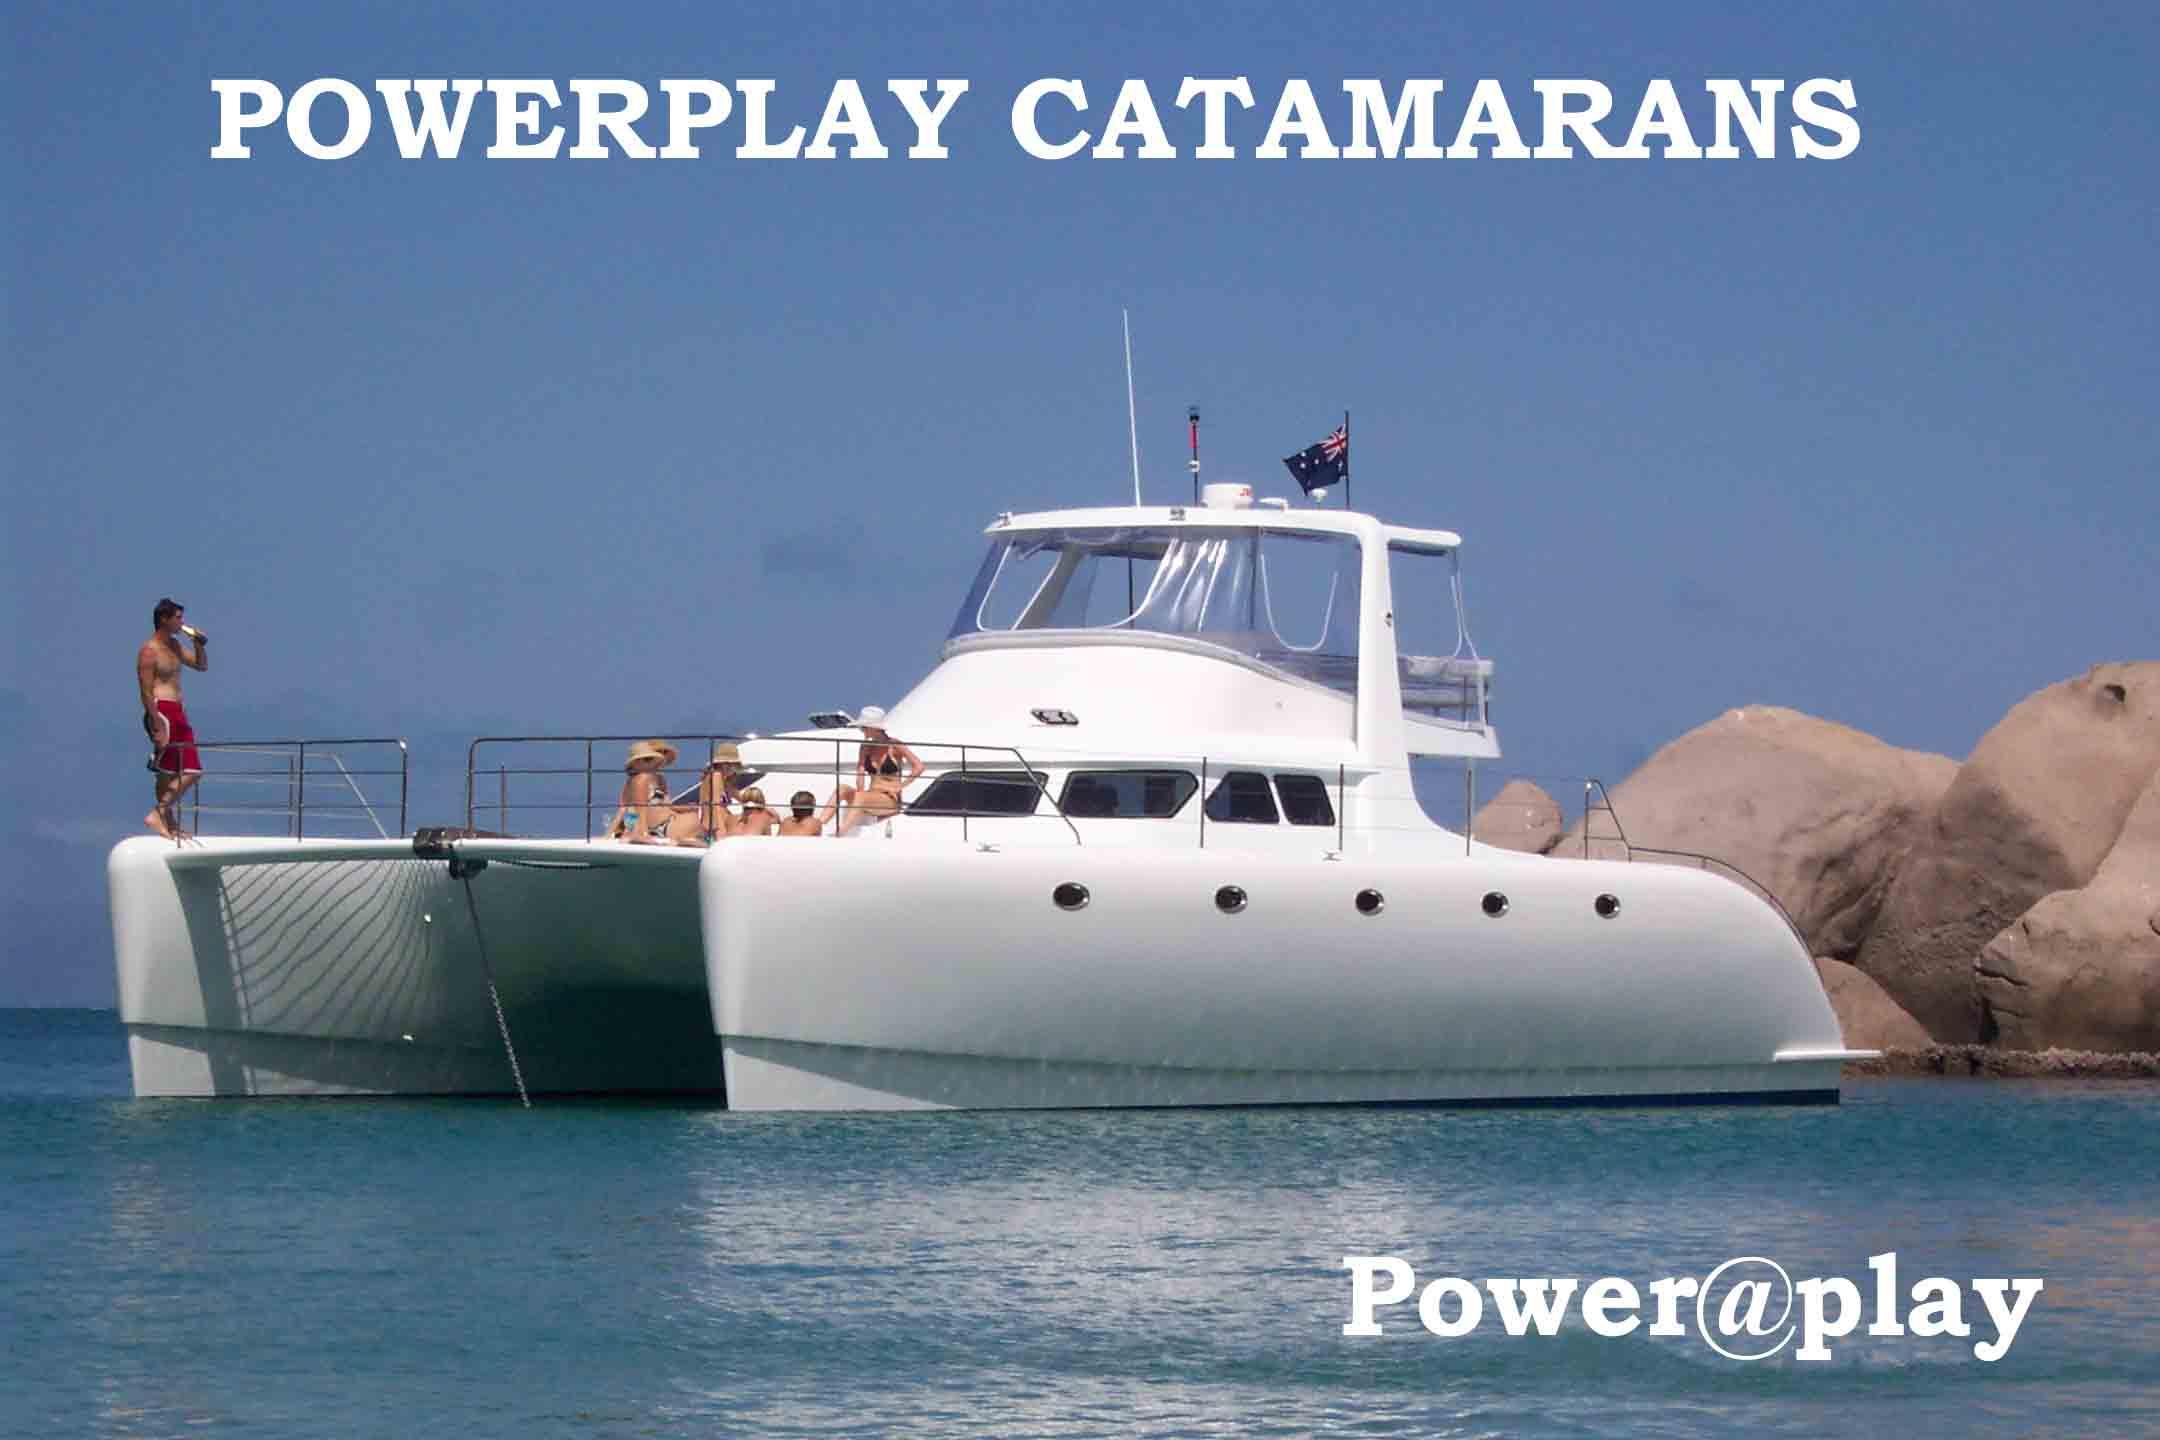 Power catamaran designs - Power Play Catamaran Designs Moulds Buy Catamaran Product On Alibaba Com